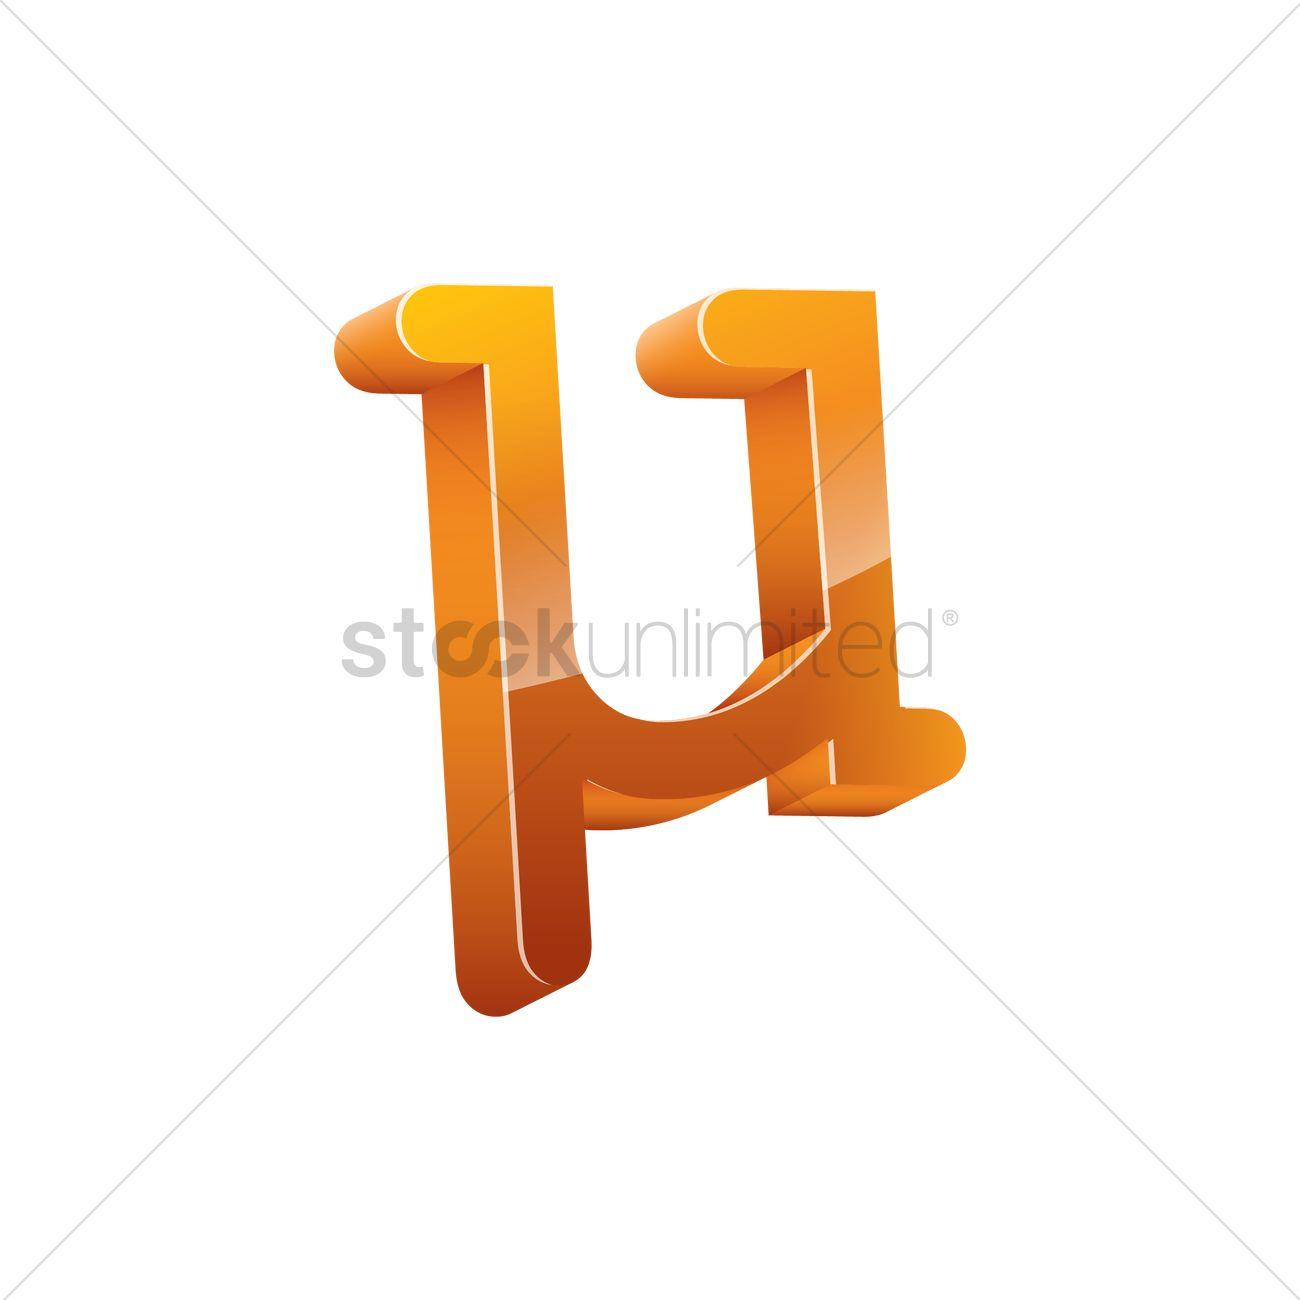 3d population mean symbol Vector Image - 1828105 ...